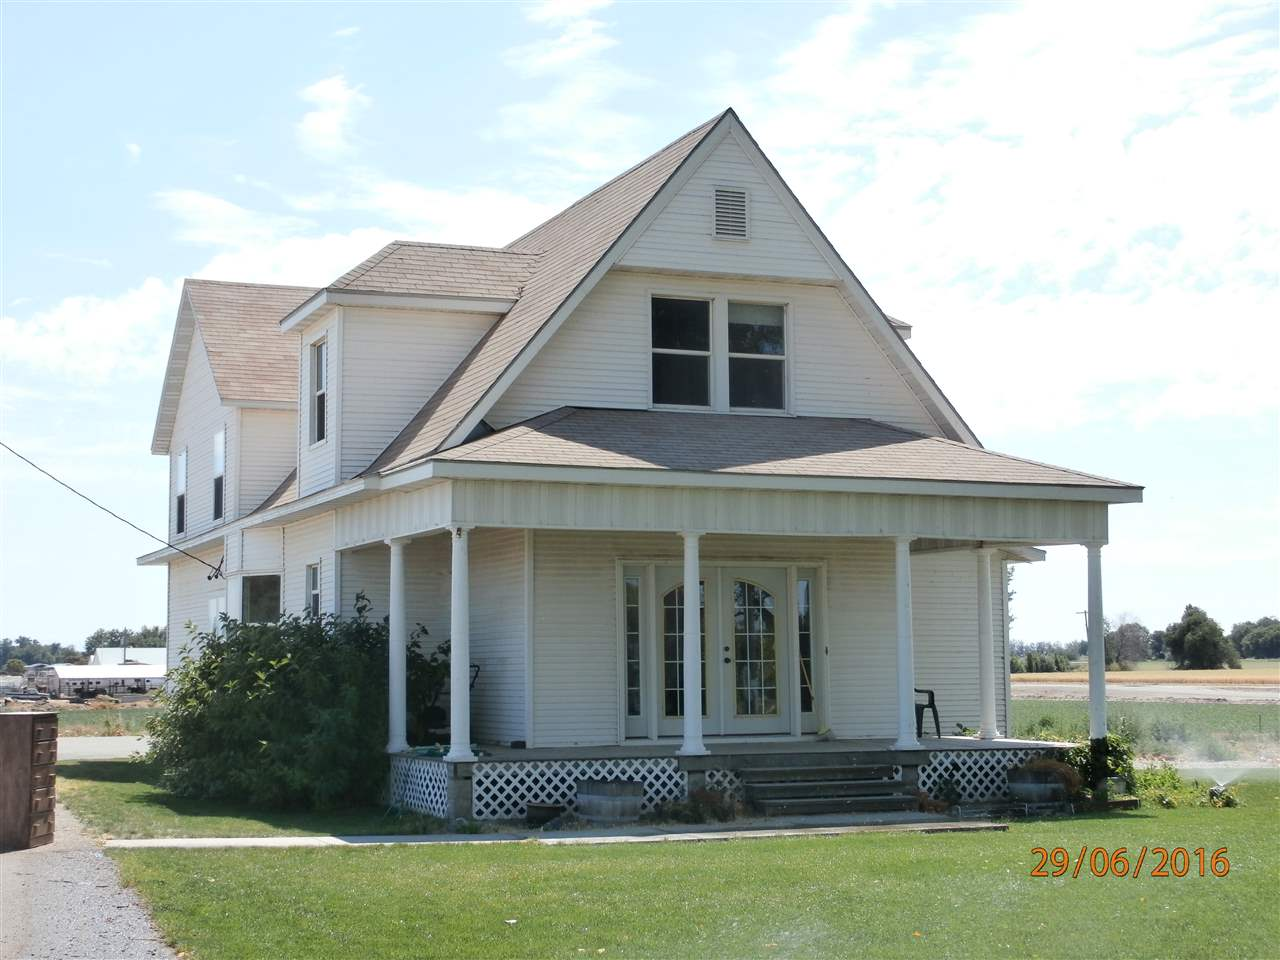 6050 Elmore Rd, Fruitland, ID 83619